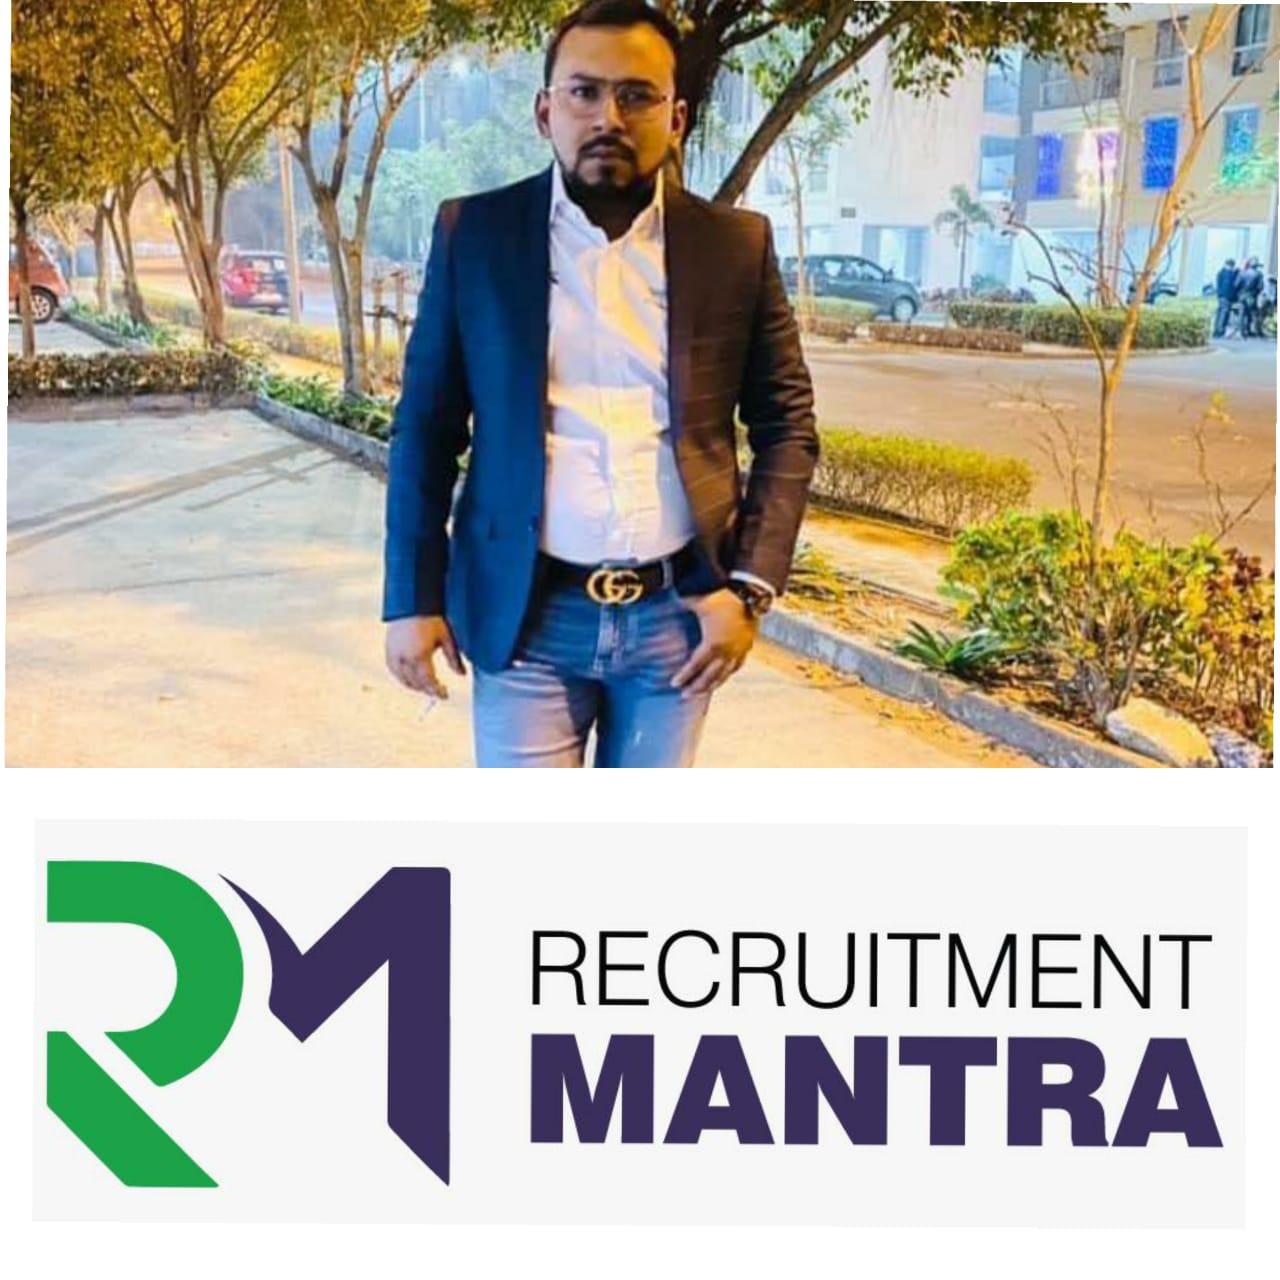 Recruitment Mantra